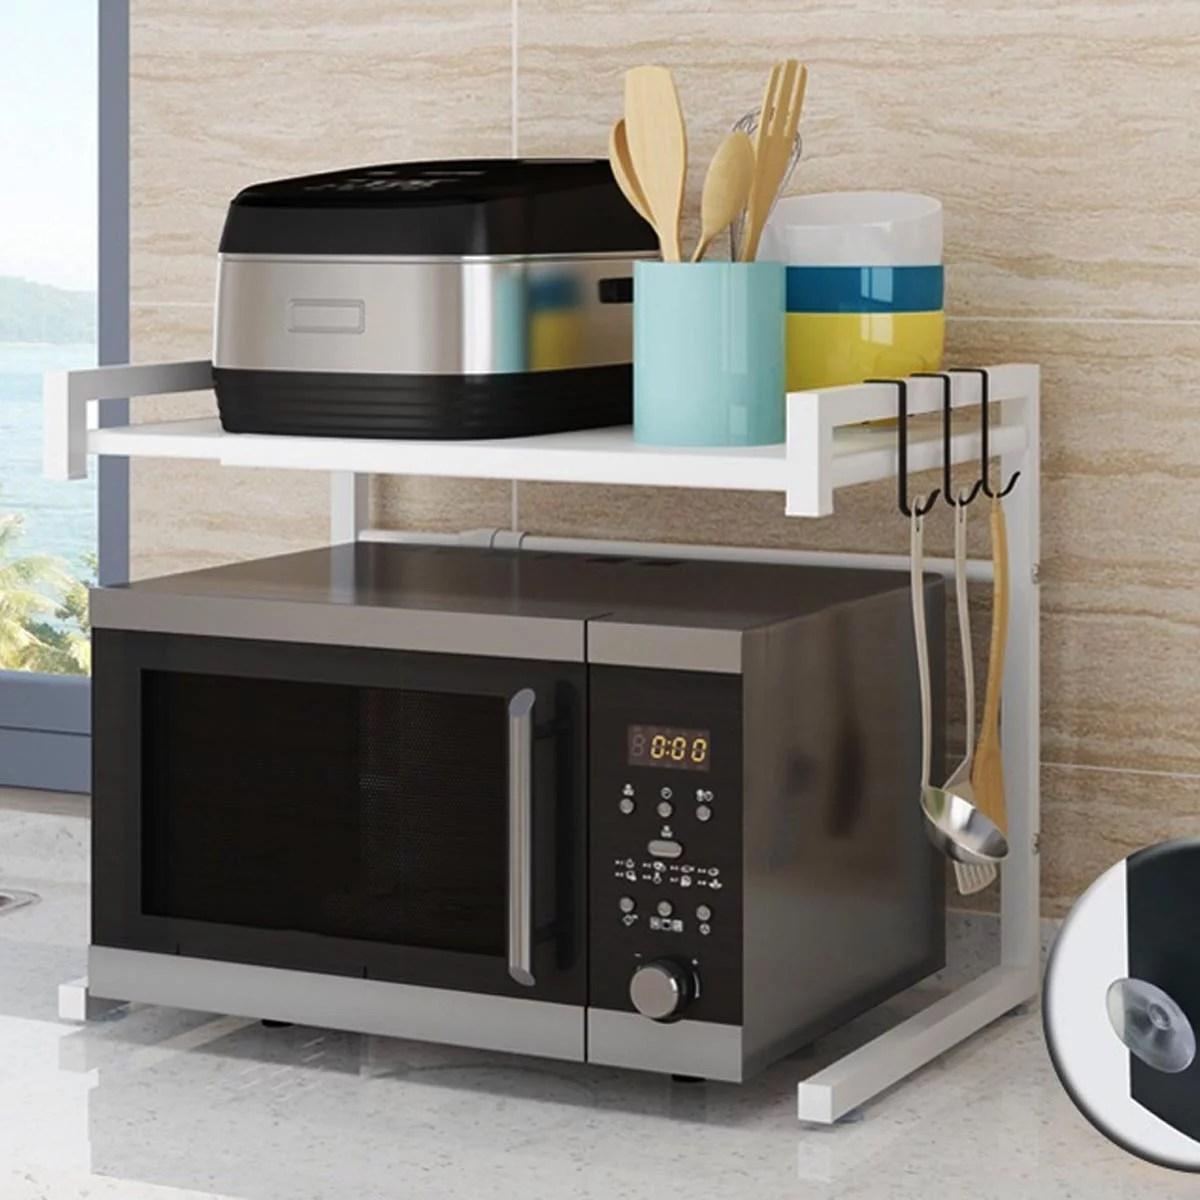 microwave oven rack retractable microwave oven rack shelf kitchen counter shelf organiser stand storage cabinet holder 3 hooks microwave mount